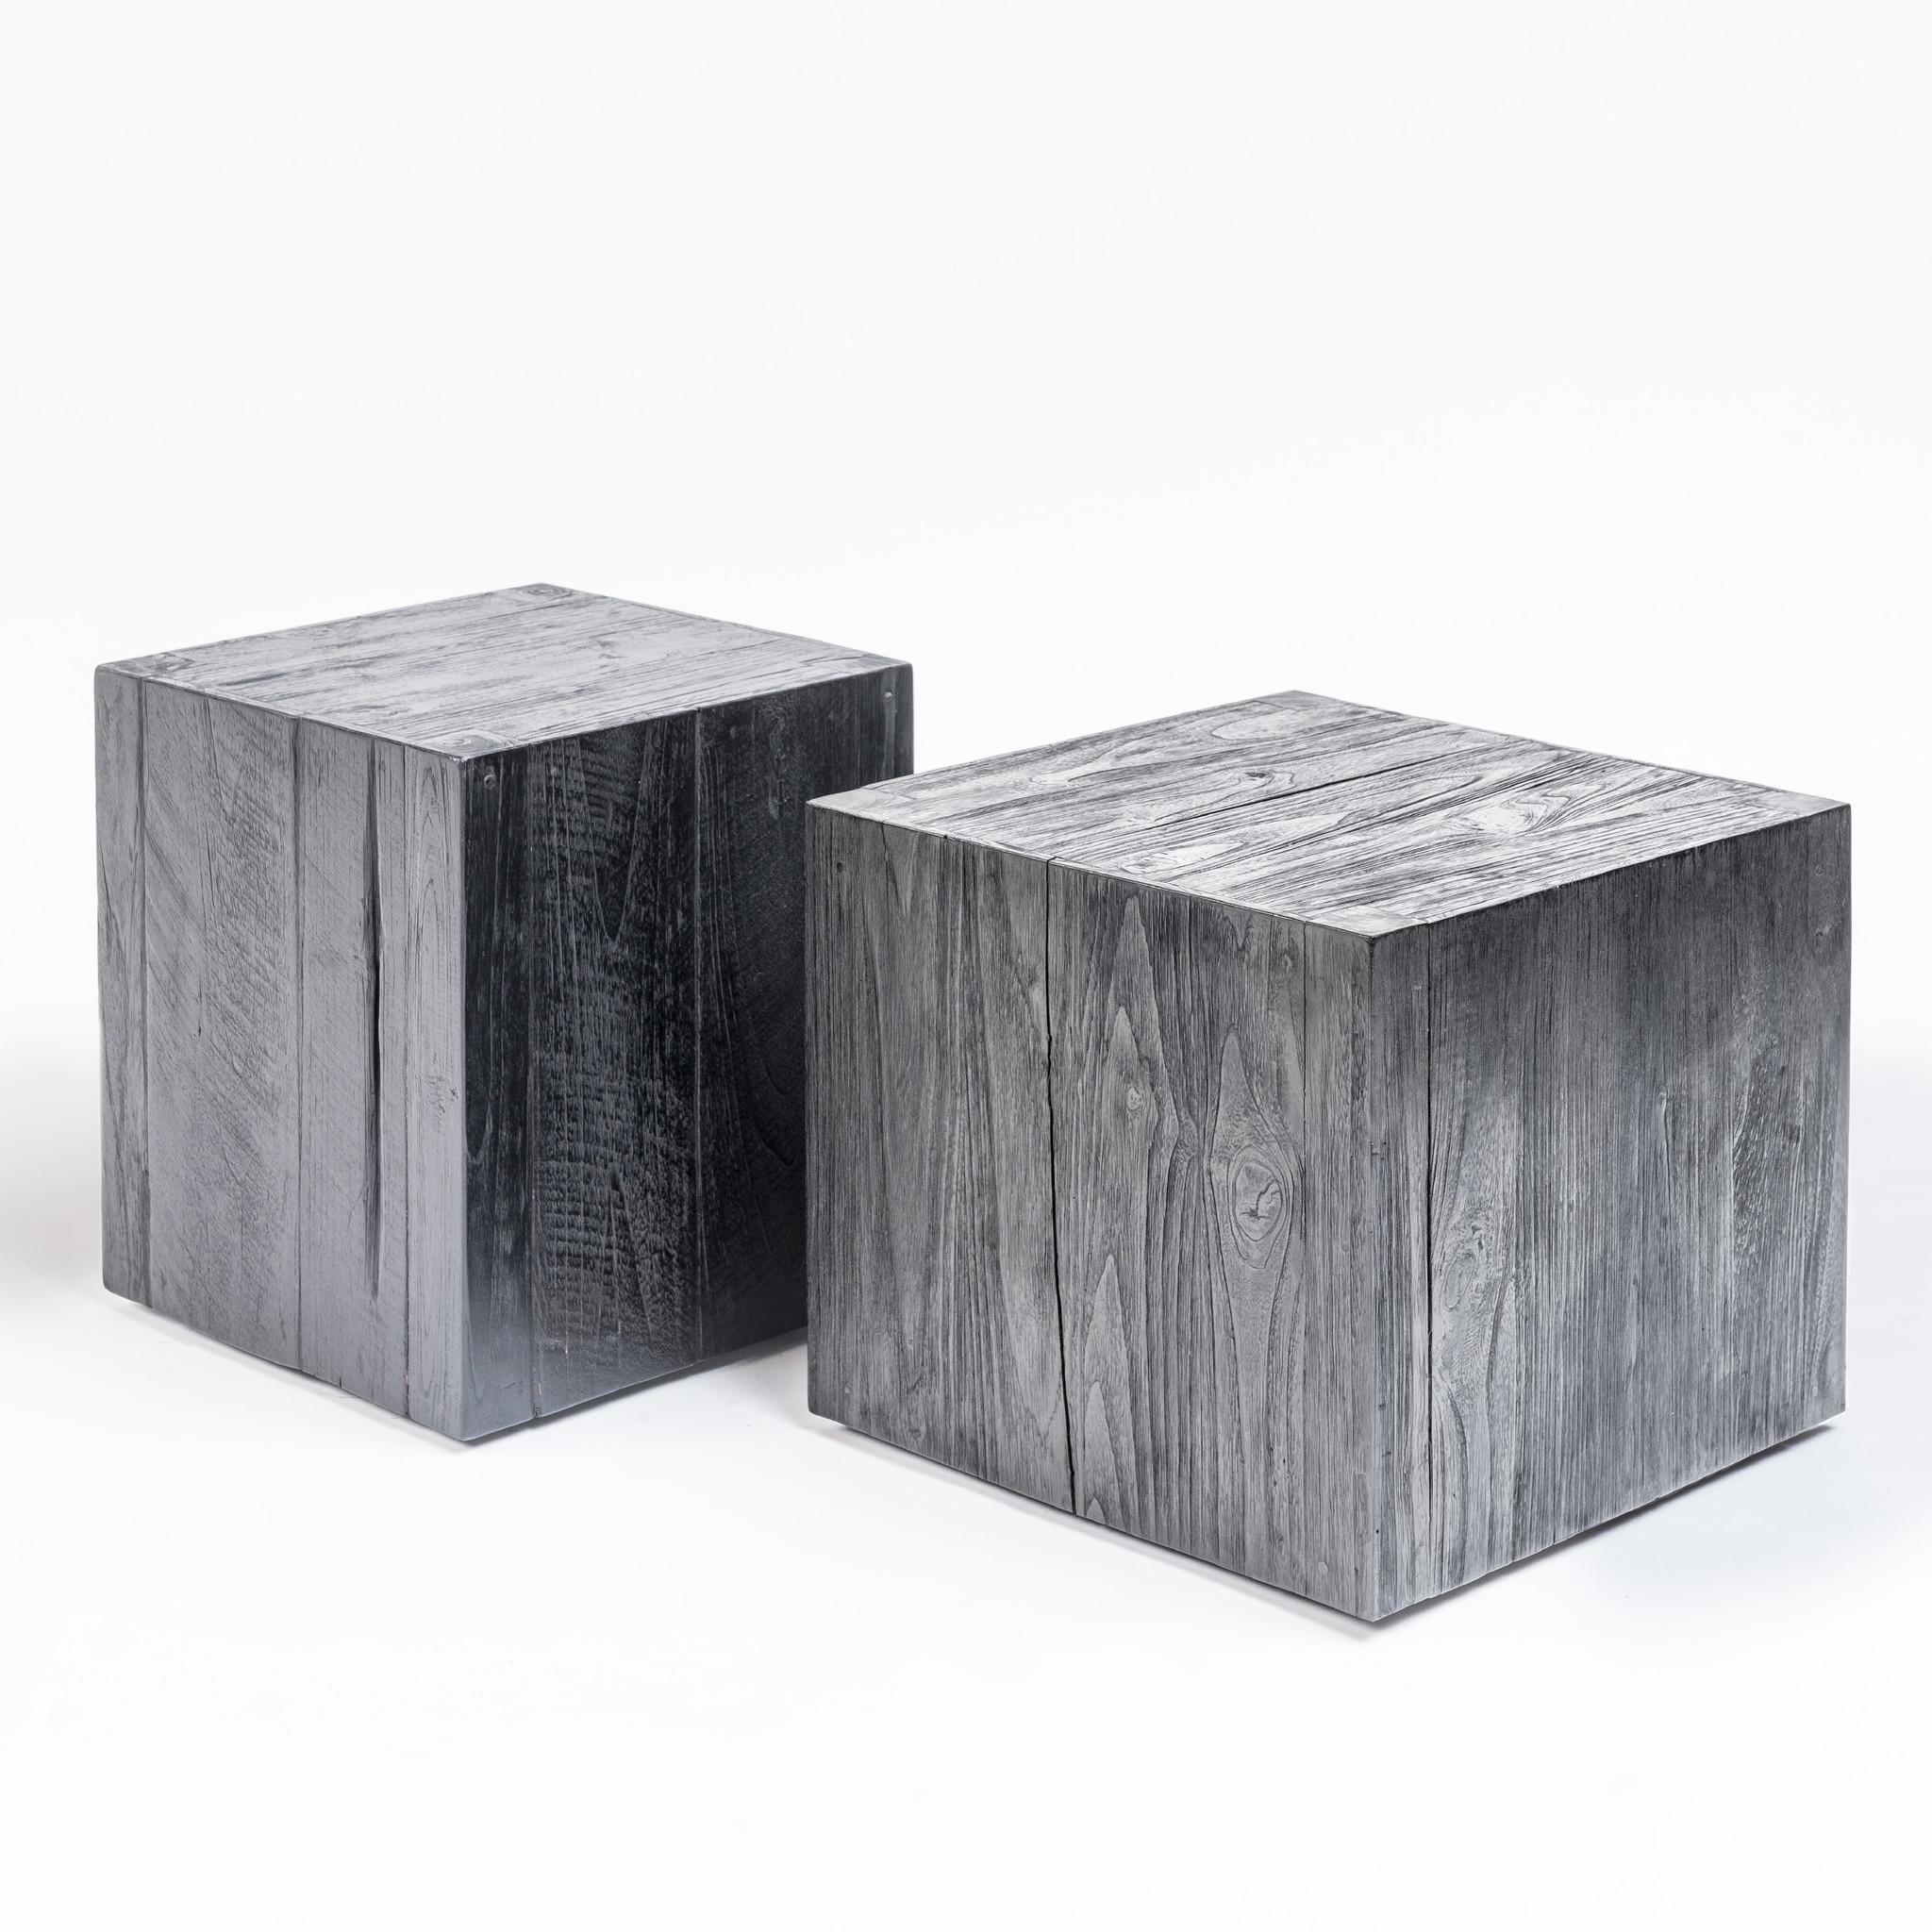 Iggy Side Table ASTELE : Console Iggy from www.astele.com size 2048 x 2048 jpeg 611kB